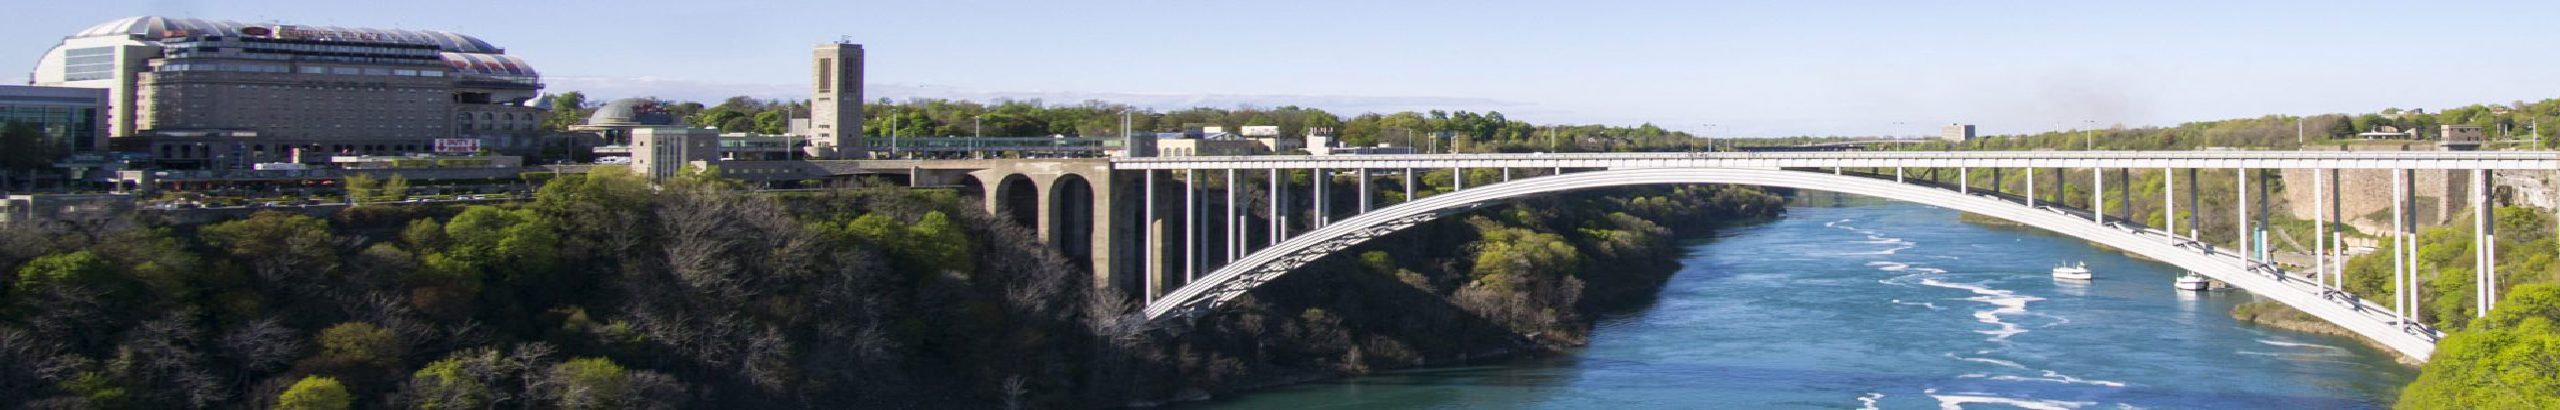 This is an image of Niagara Falls bridge in Buffalo New York where ASTA-USA ASTA-USA provides professional translation services.